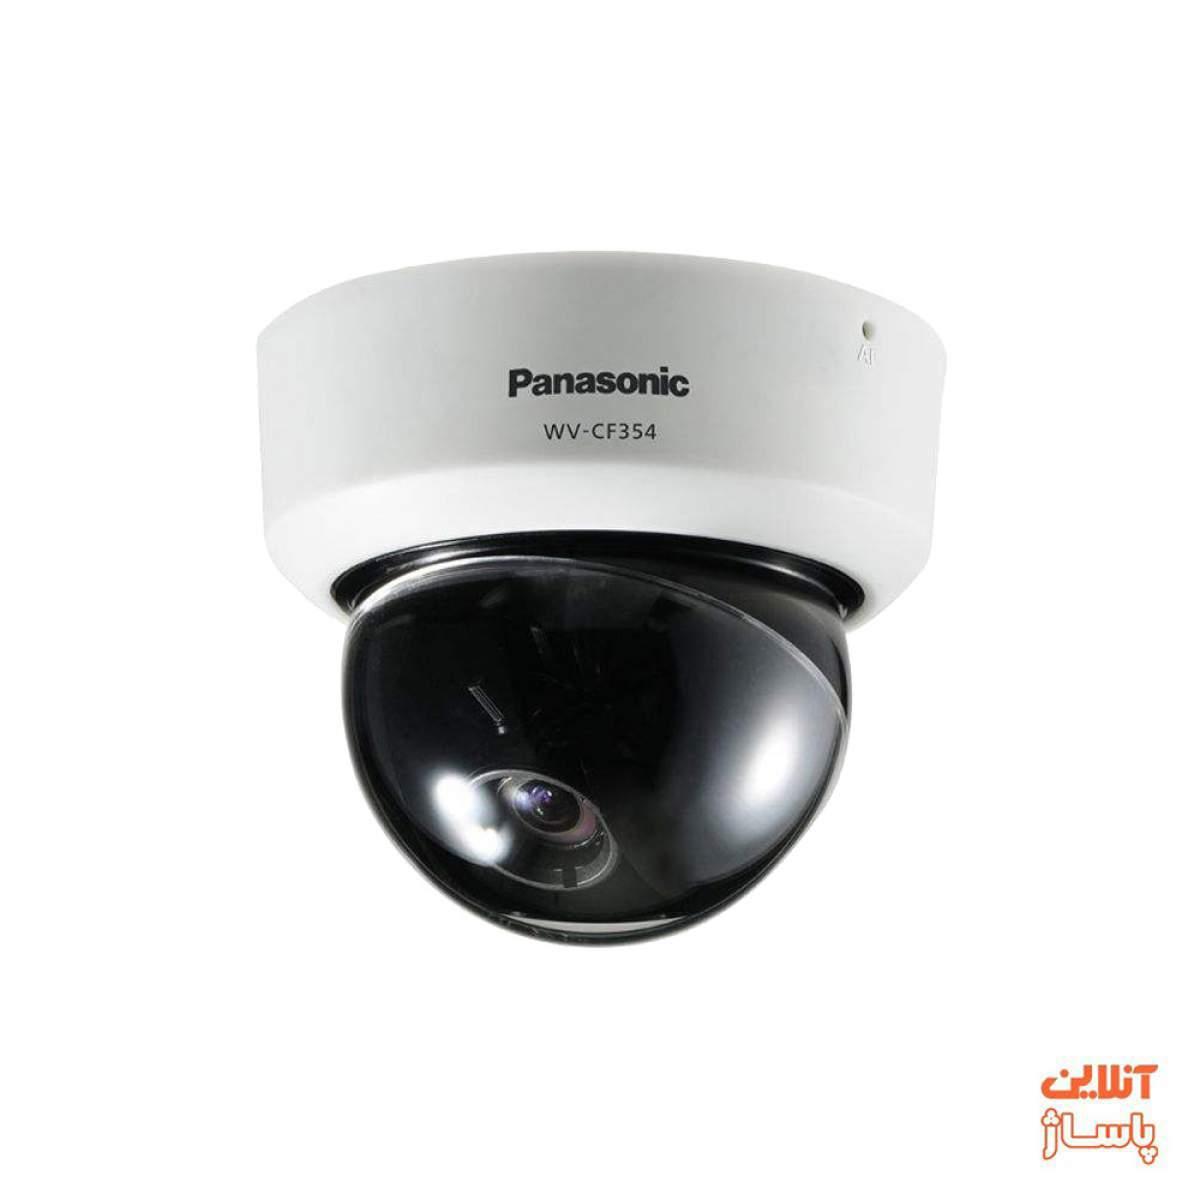 دوربین مداربسته آنالوگ پاناسونیک مدل WV-CF354E